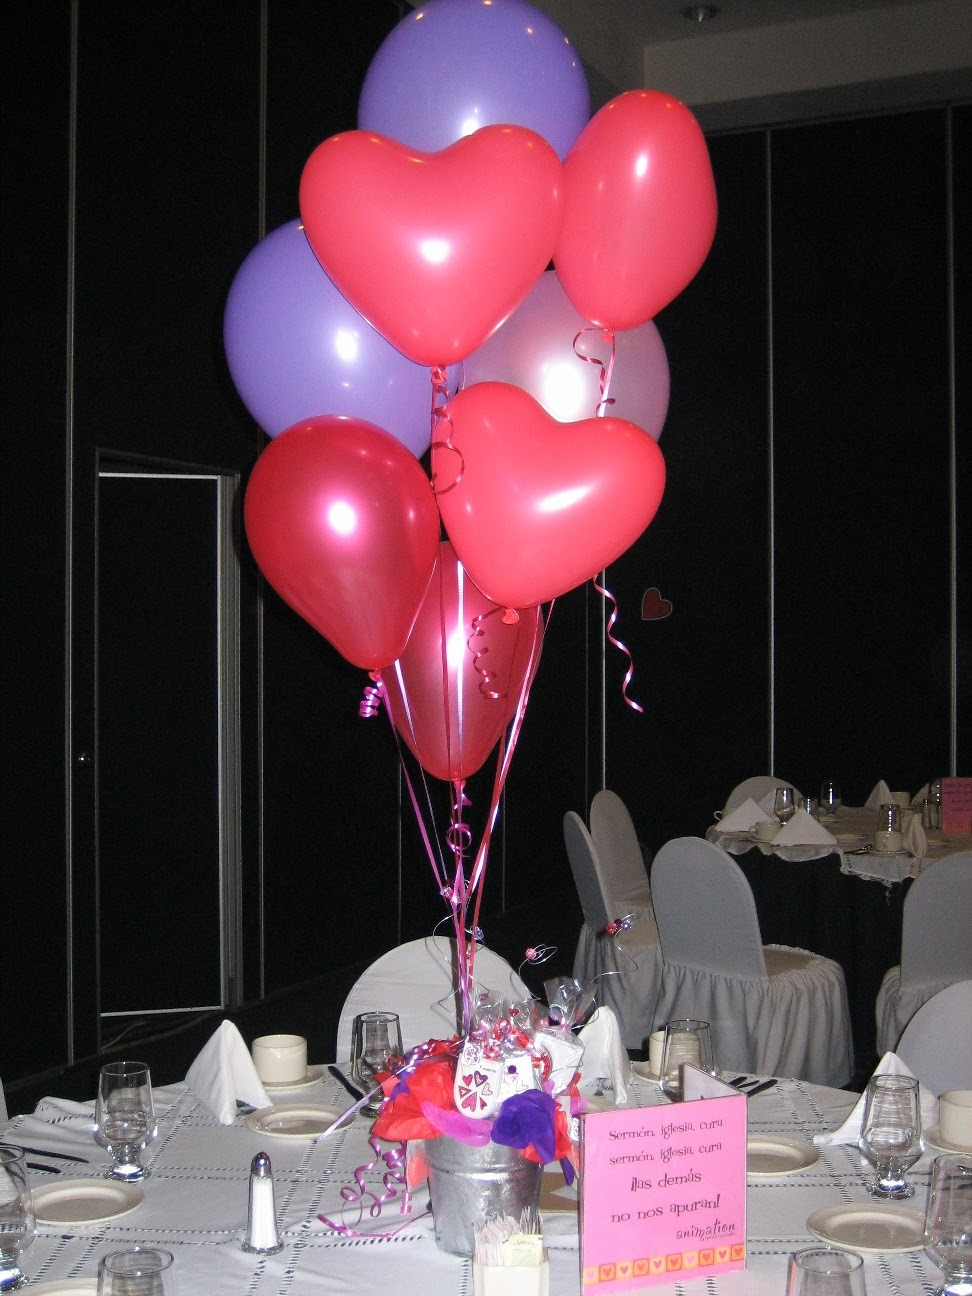 Decoraciones con globos taringa auto design tech - Decoraciones con globos ...